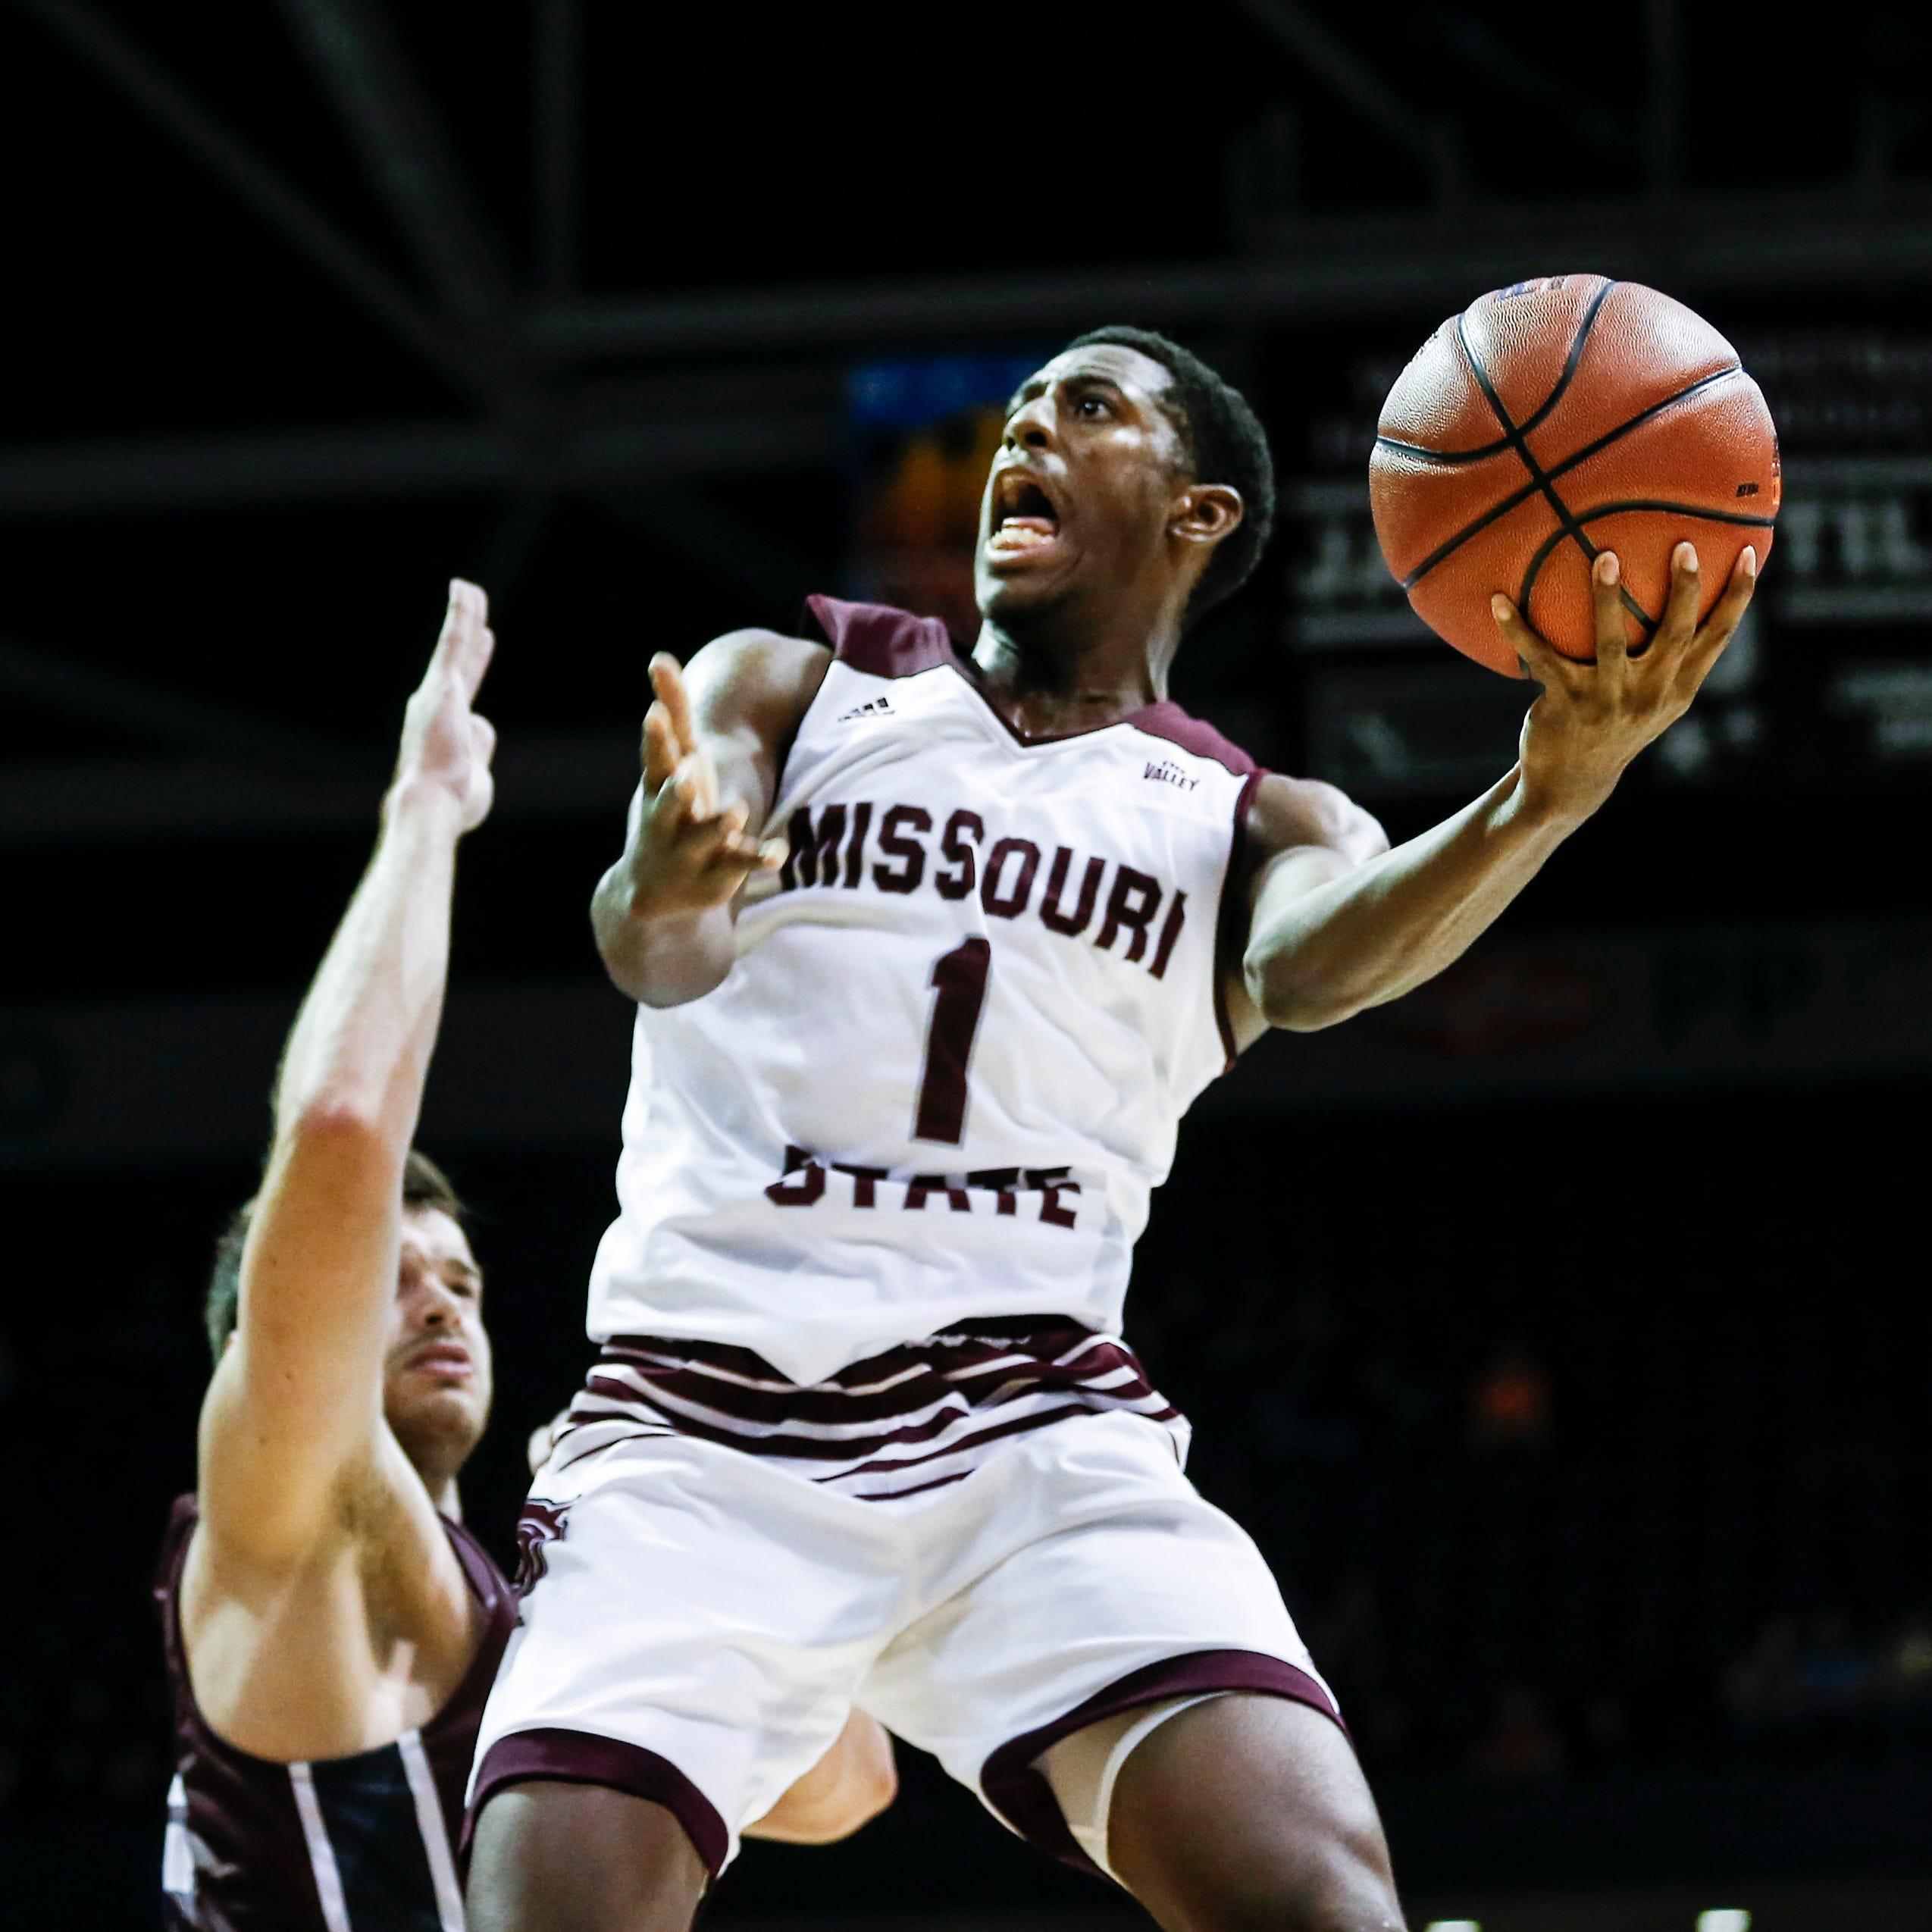 Keandre Cook plays hero as Missouri State pulls off comeback at Bradley